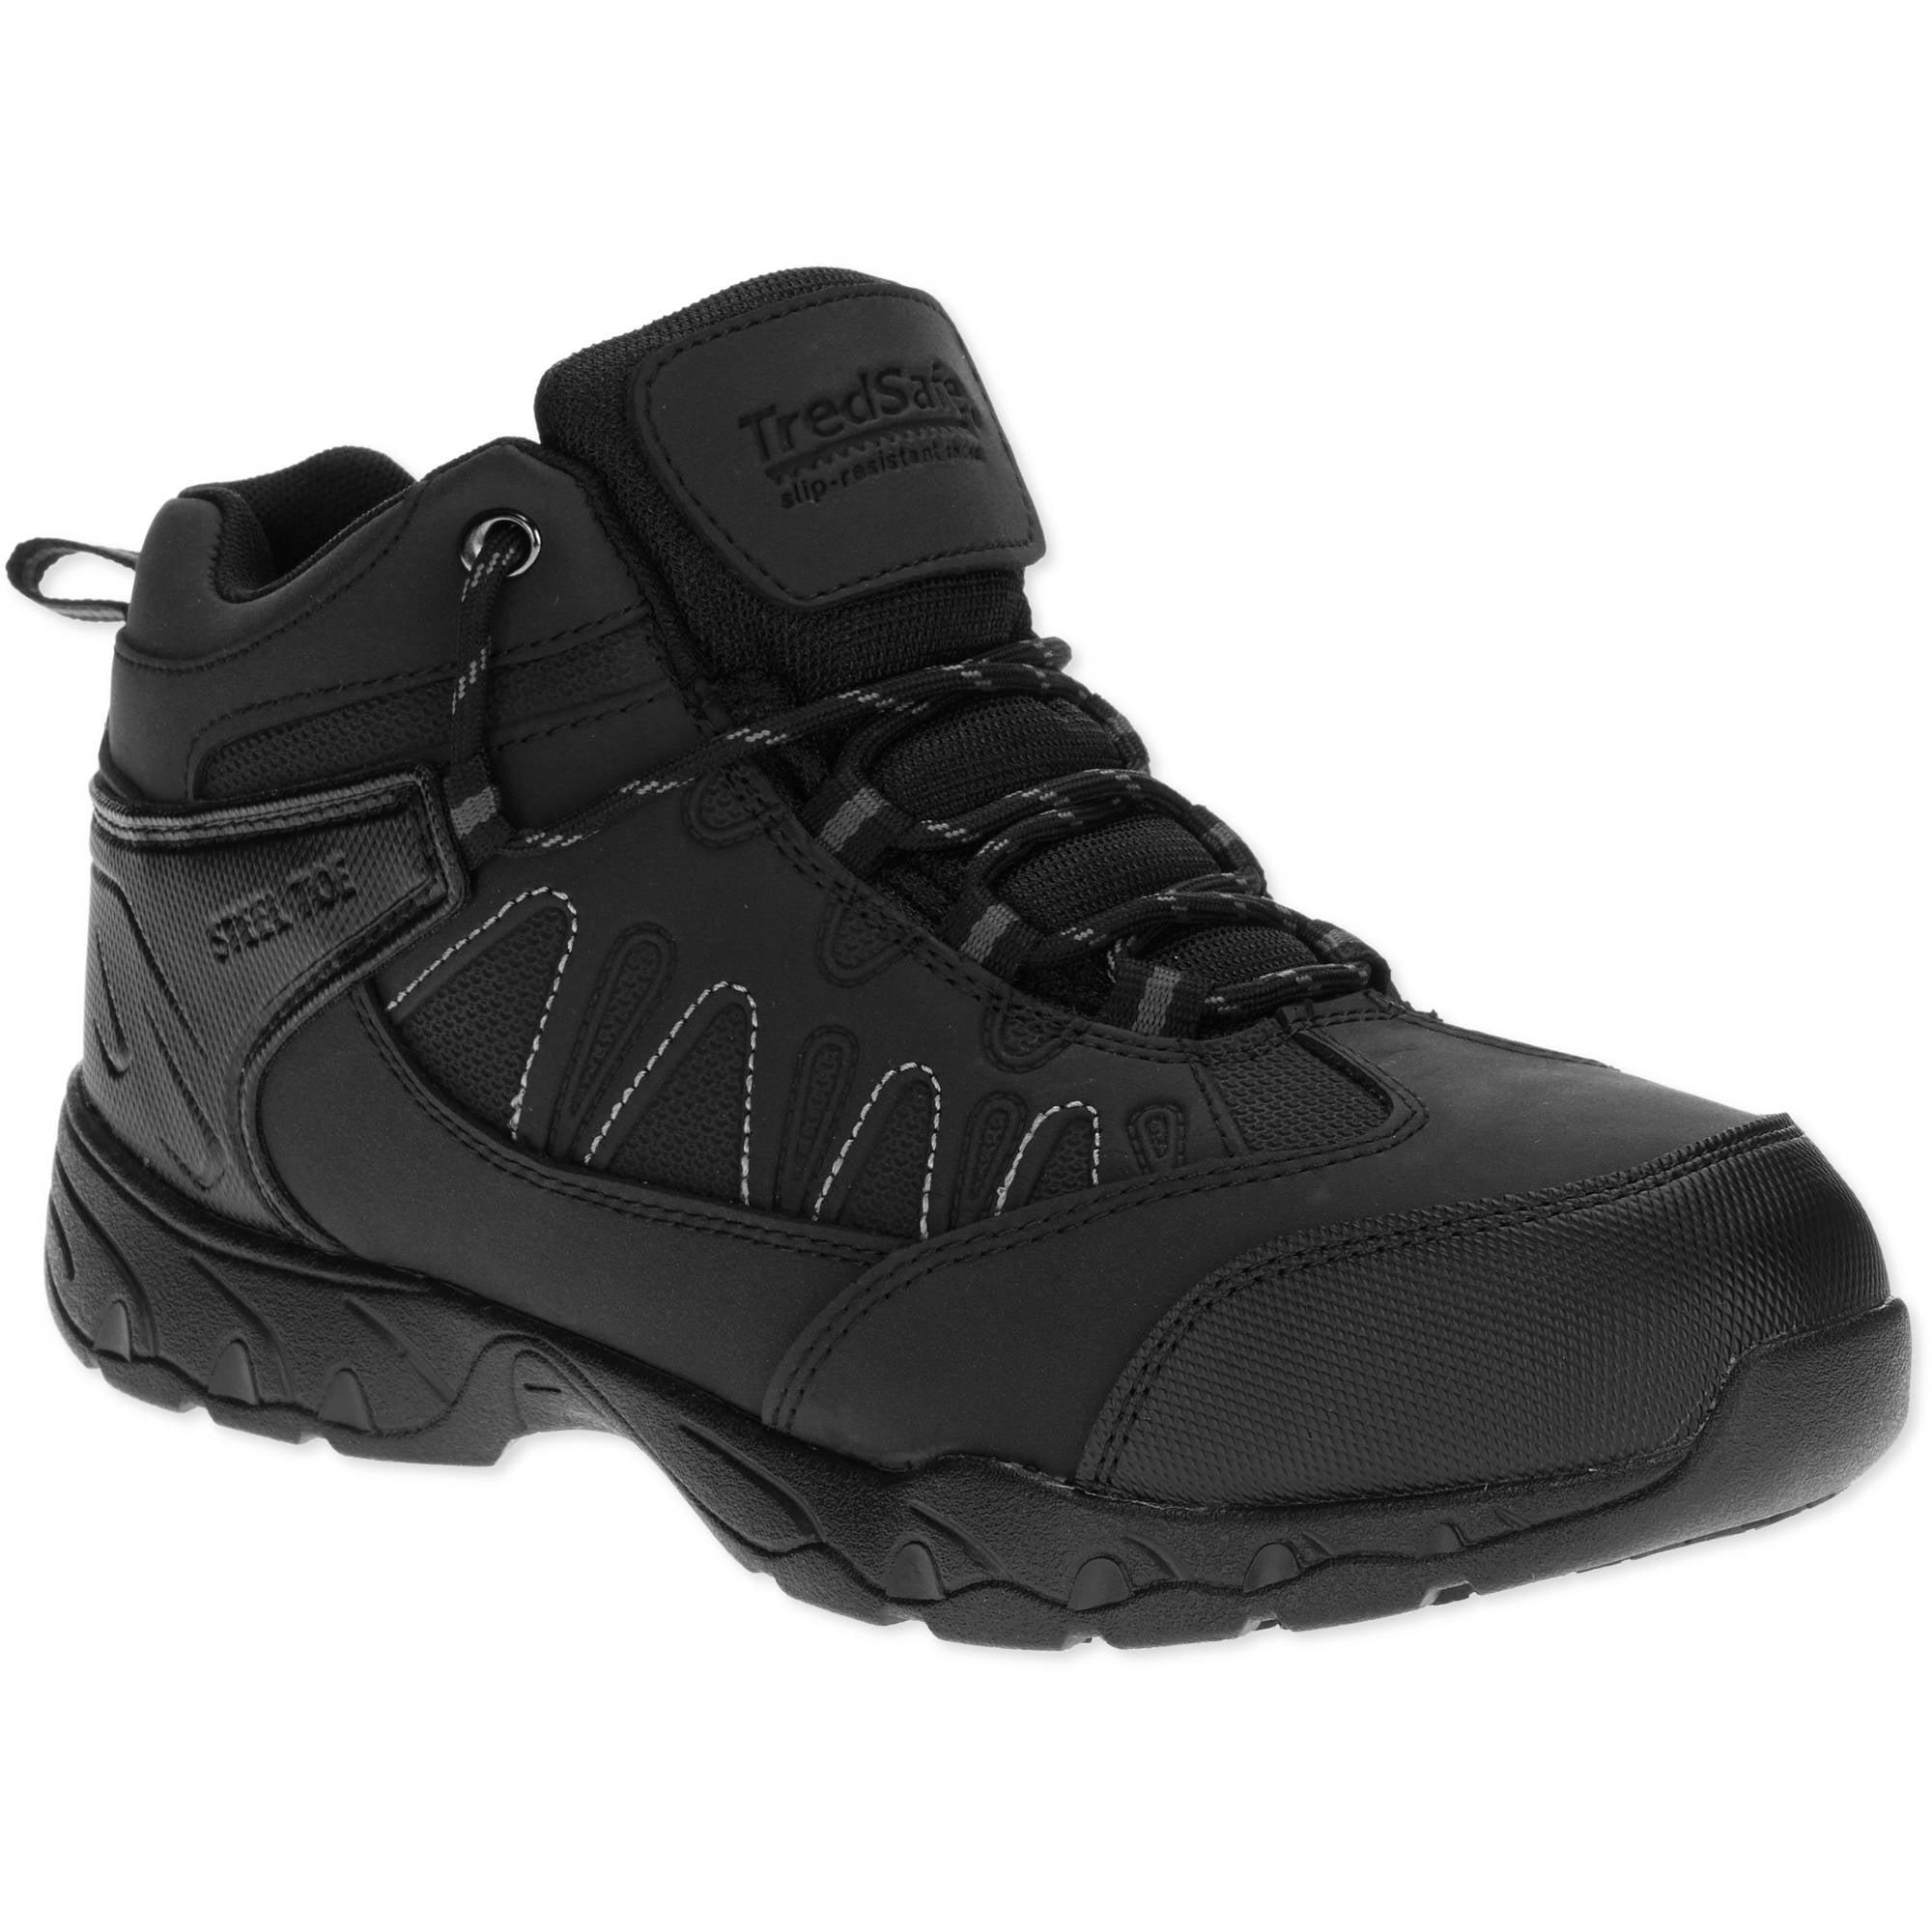 Tredsafe Menu0027s Axel Slip Resistant Athletic Shoe